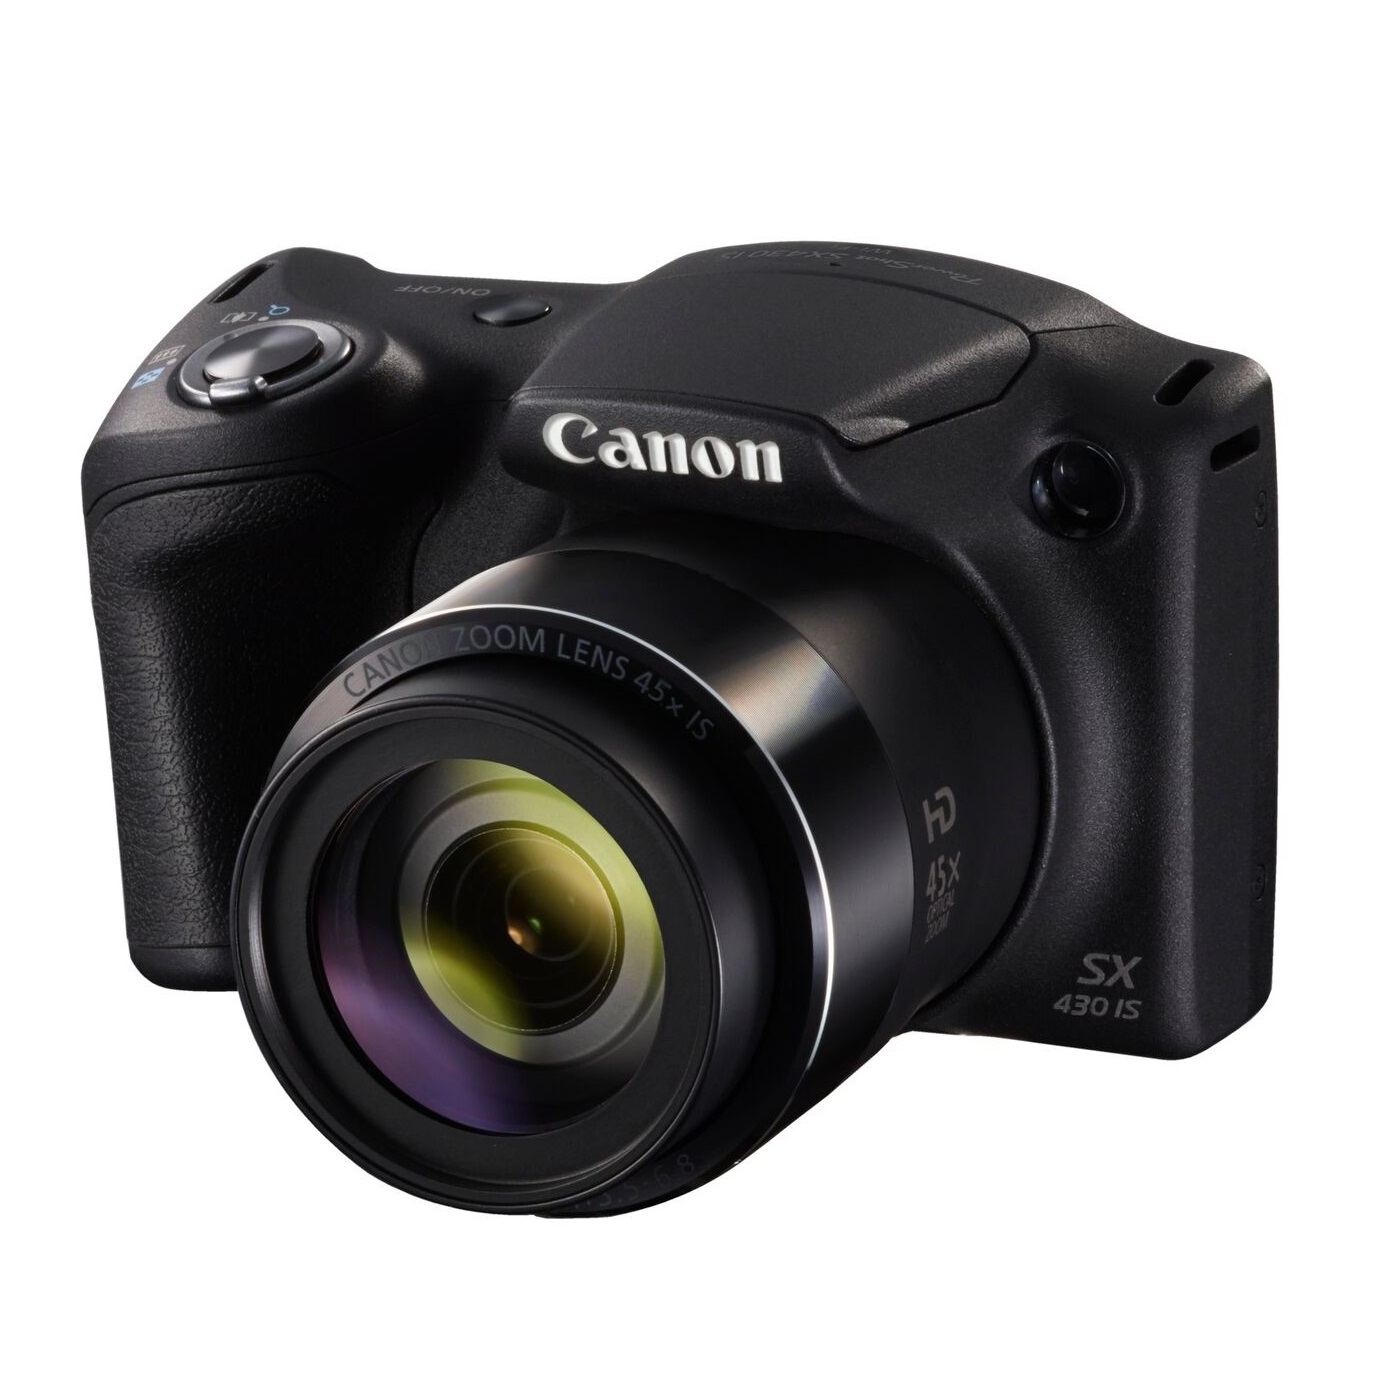 Canon cameras at Digital Camera Warehouse - Buy Now